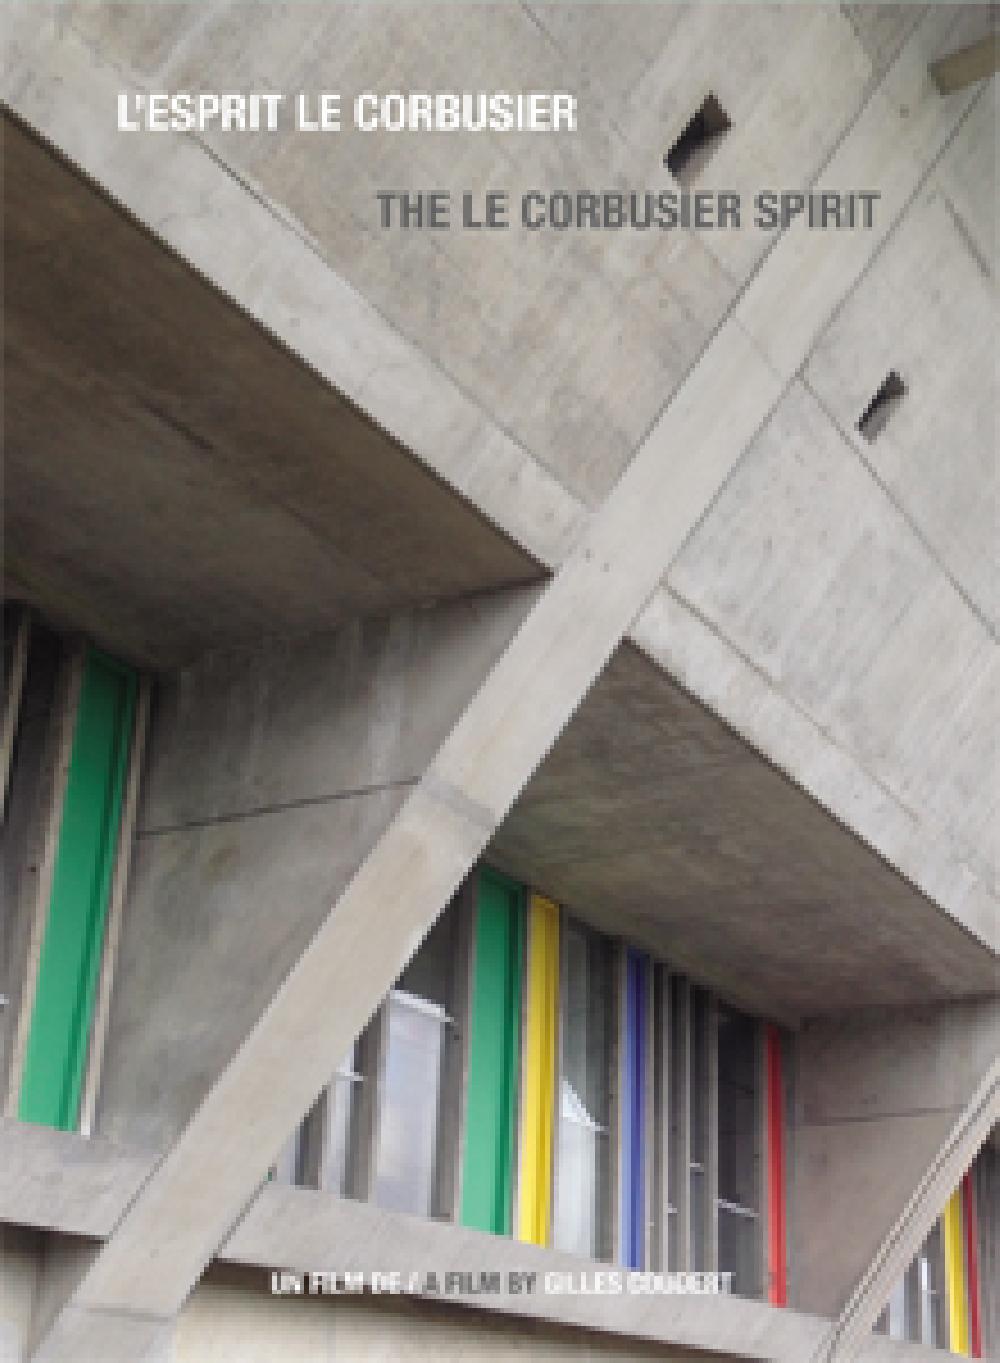 The Corbusier spirit